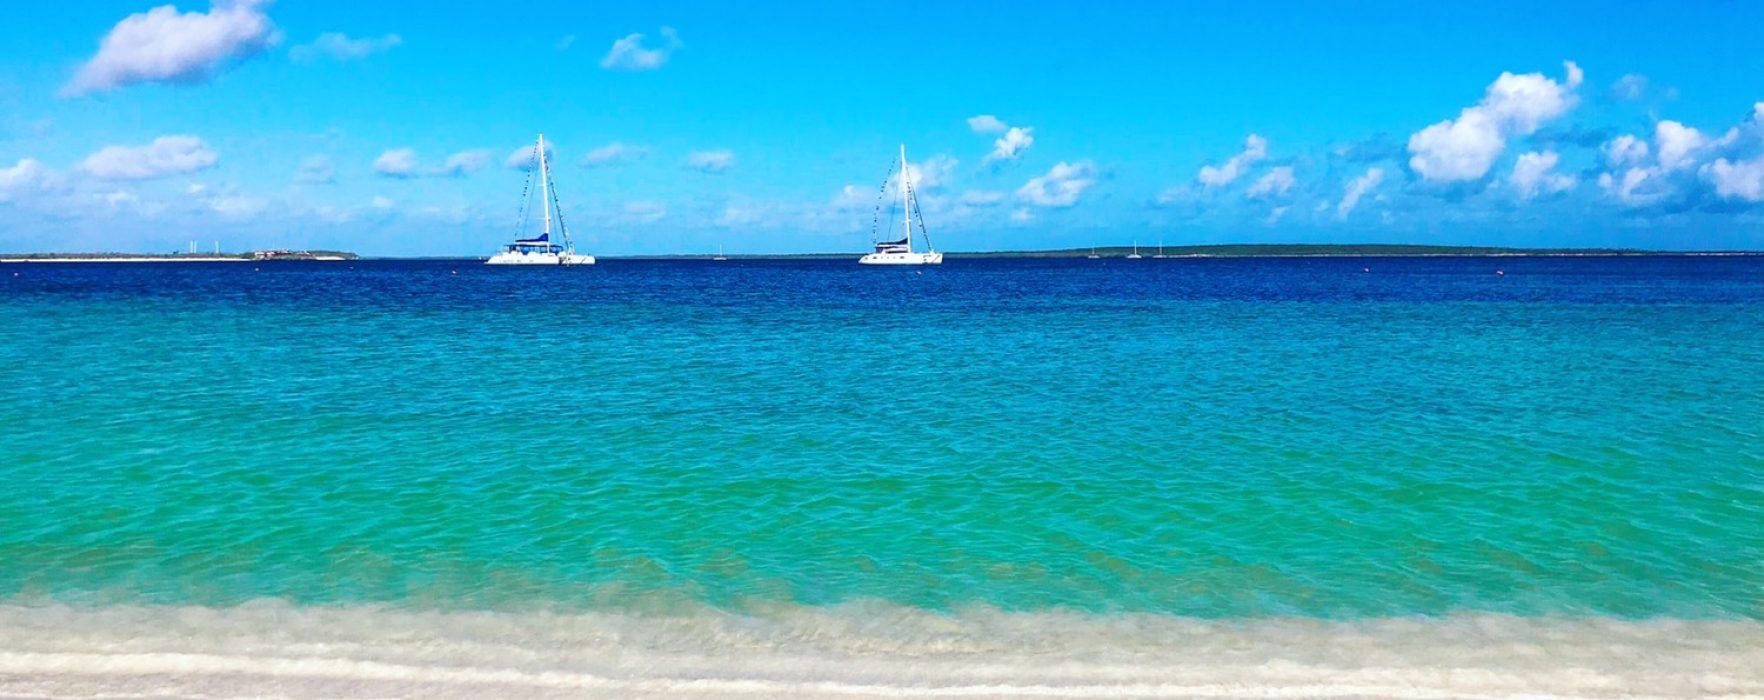 Exploring Cuba's islands: 5 reasons to visit the Villa Clara Keys